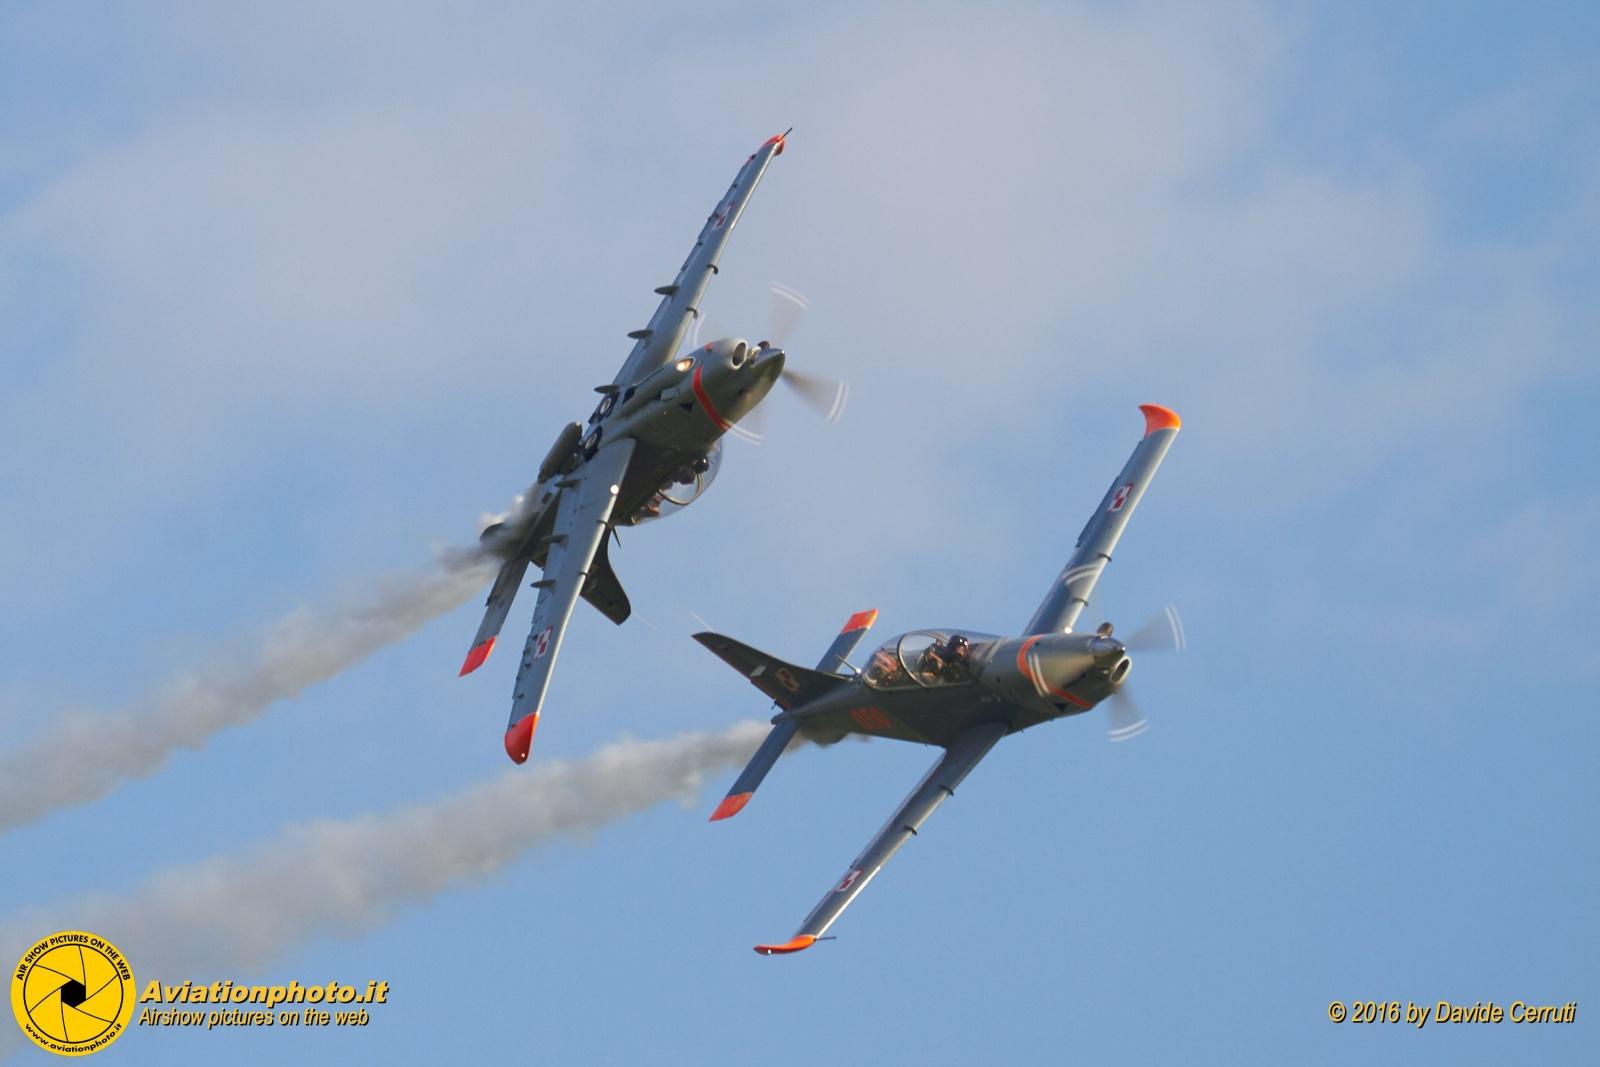 Airpower 16 - Zeltweg Air Base - Friday Display